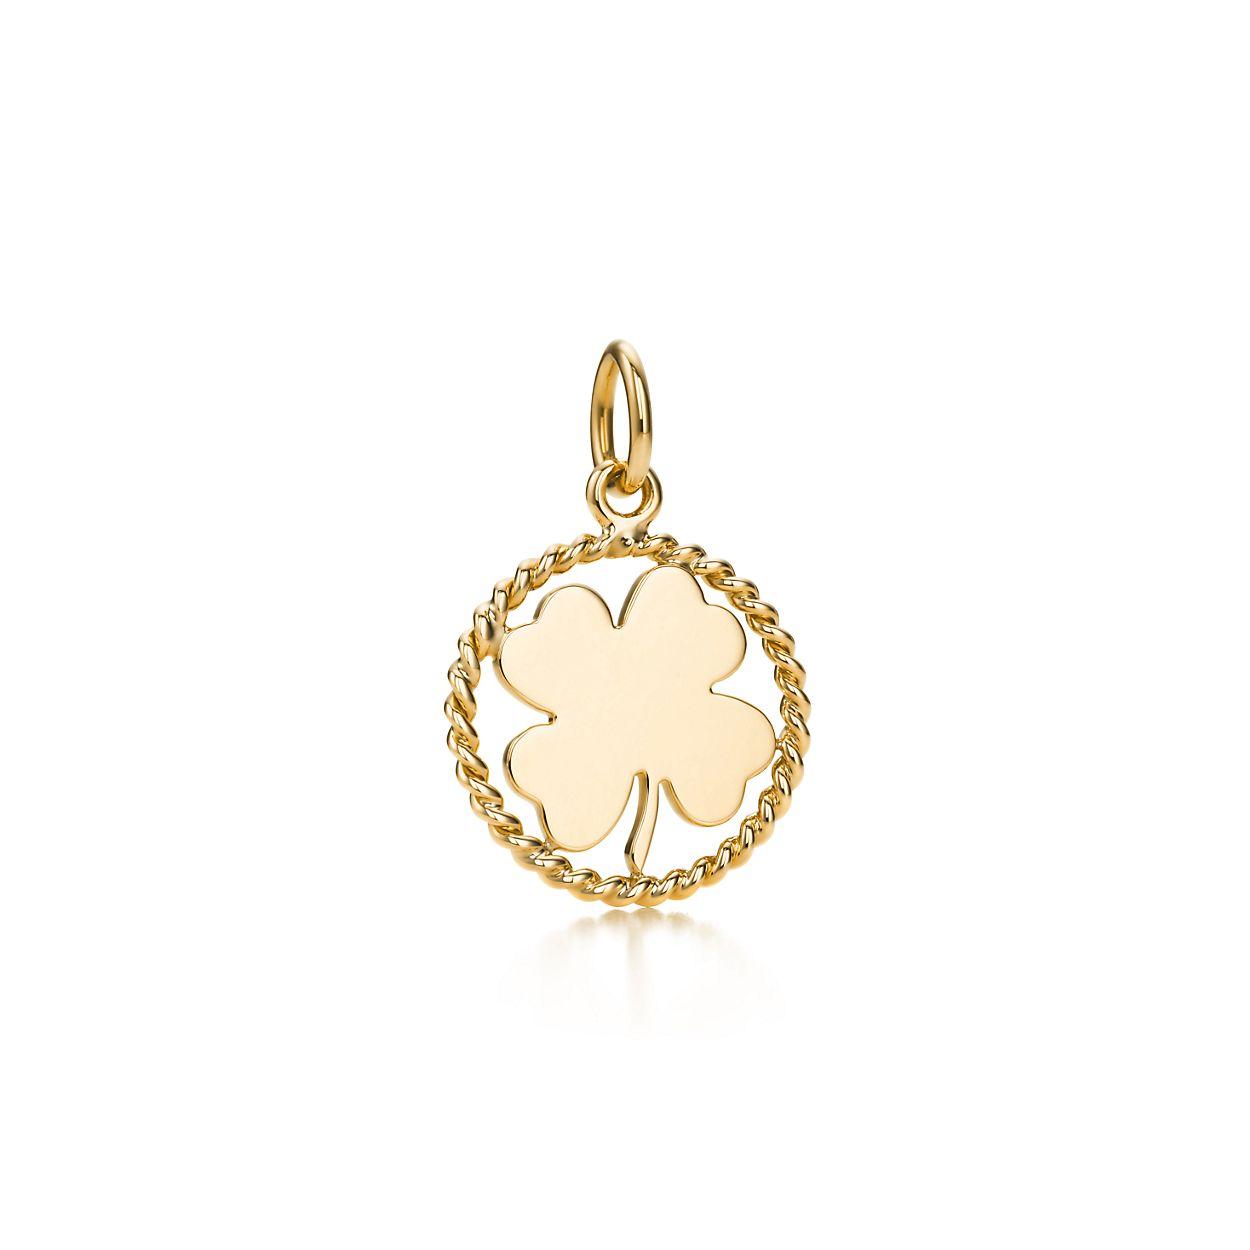 Tiffany Twist clover charm in 18k gold, small Tiffany & Co.